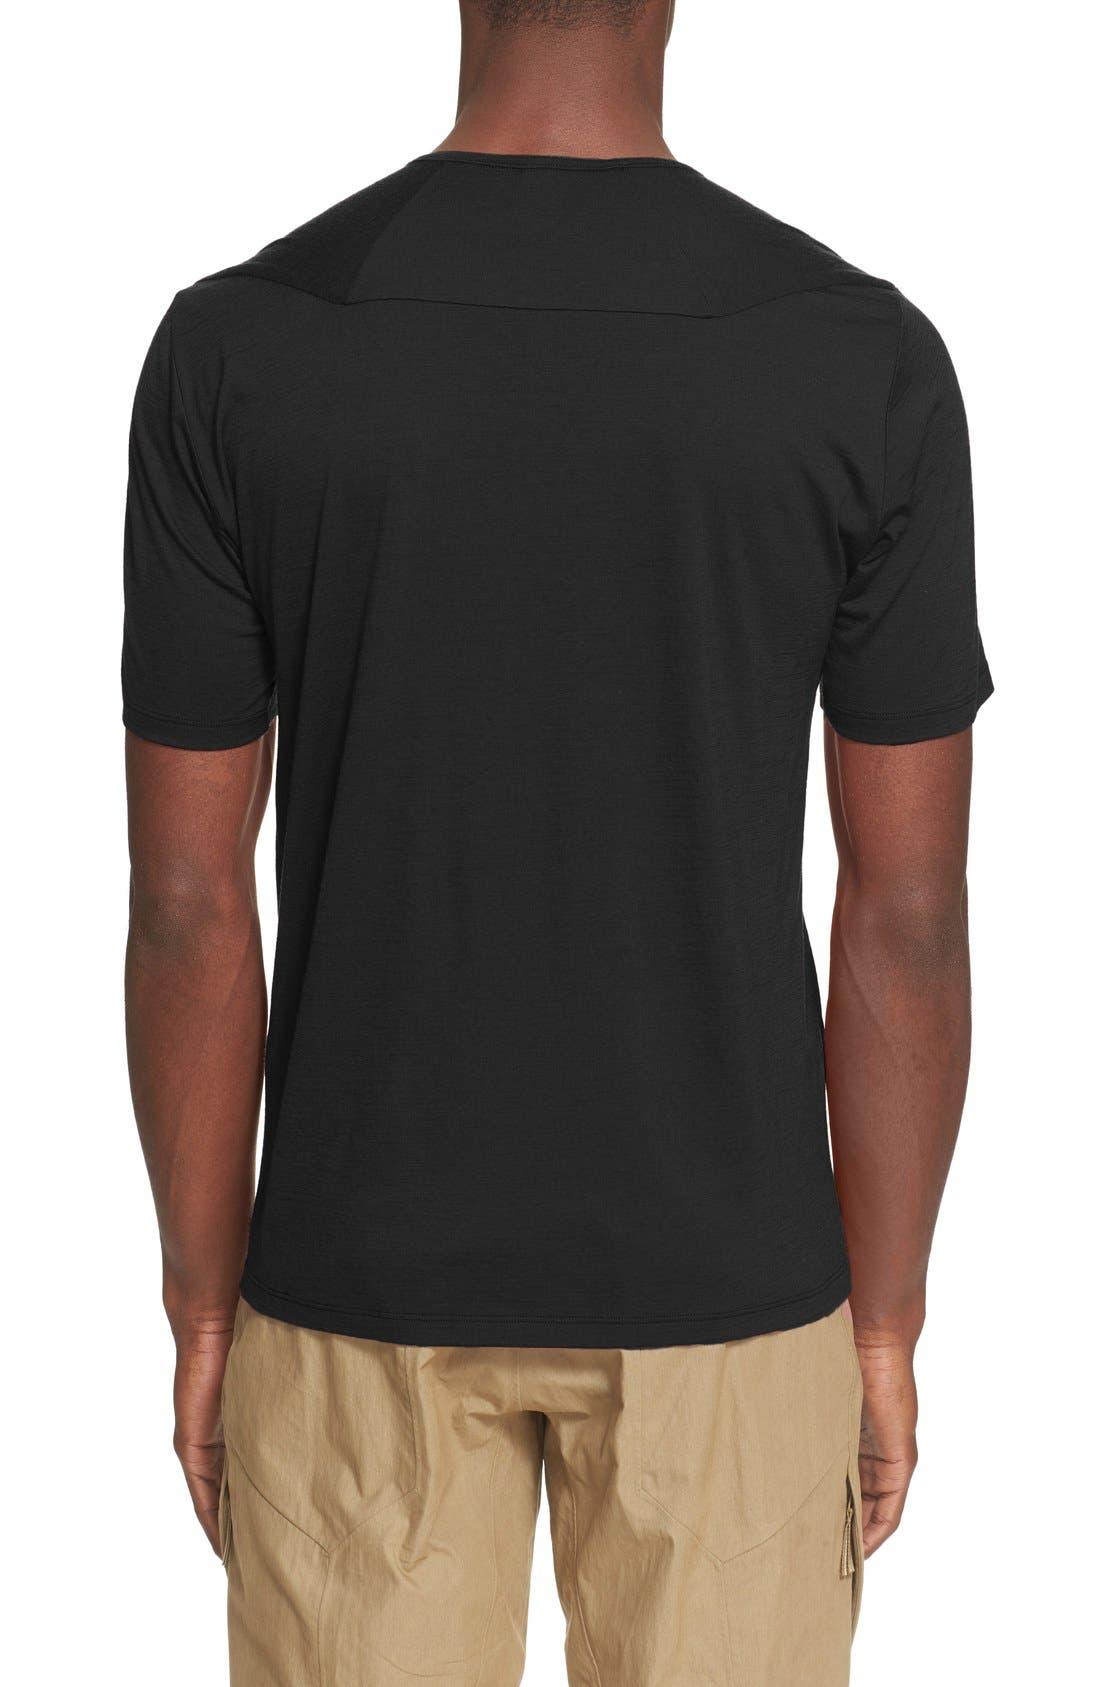 ARC'TERYX VEILANCE,                             'Frame' Merino Wool T-Shirt,                             Alternate thumbnail 2, color,                             001